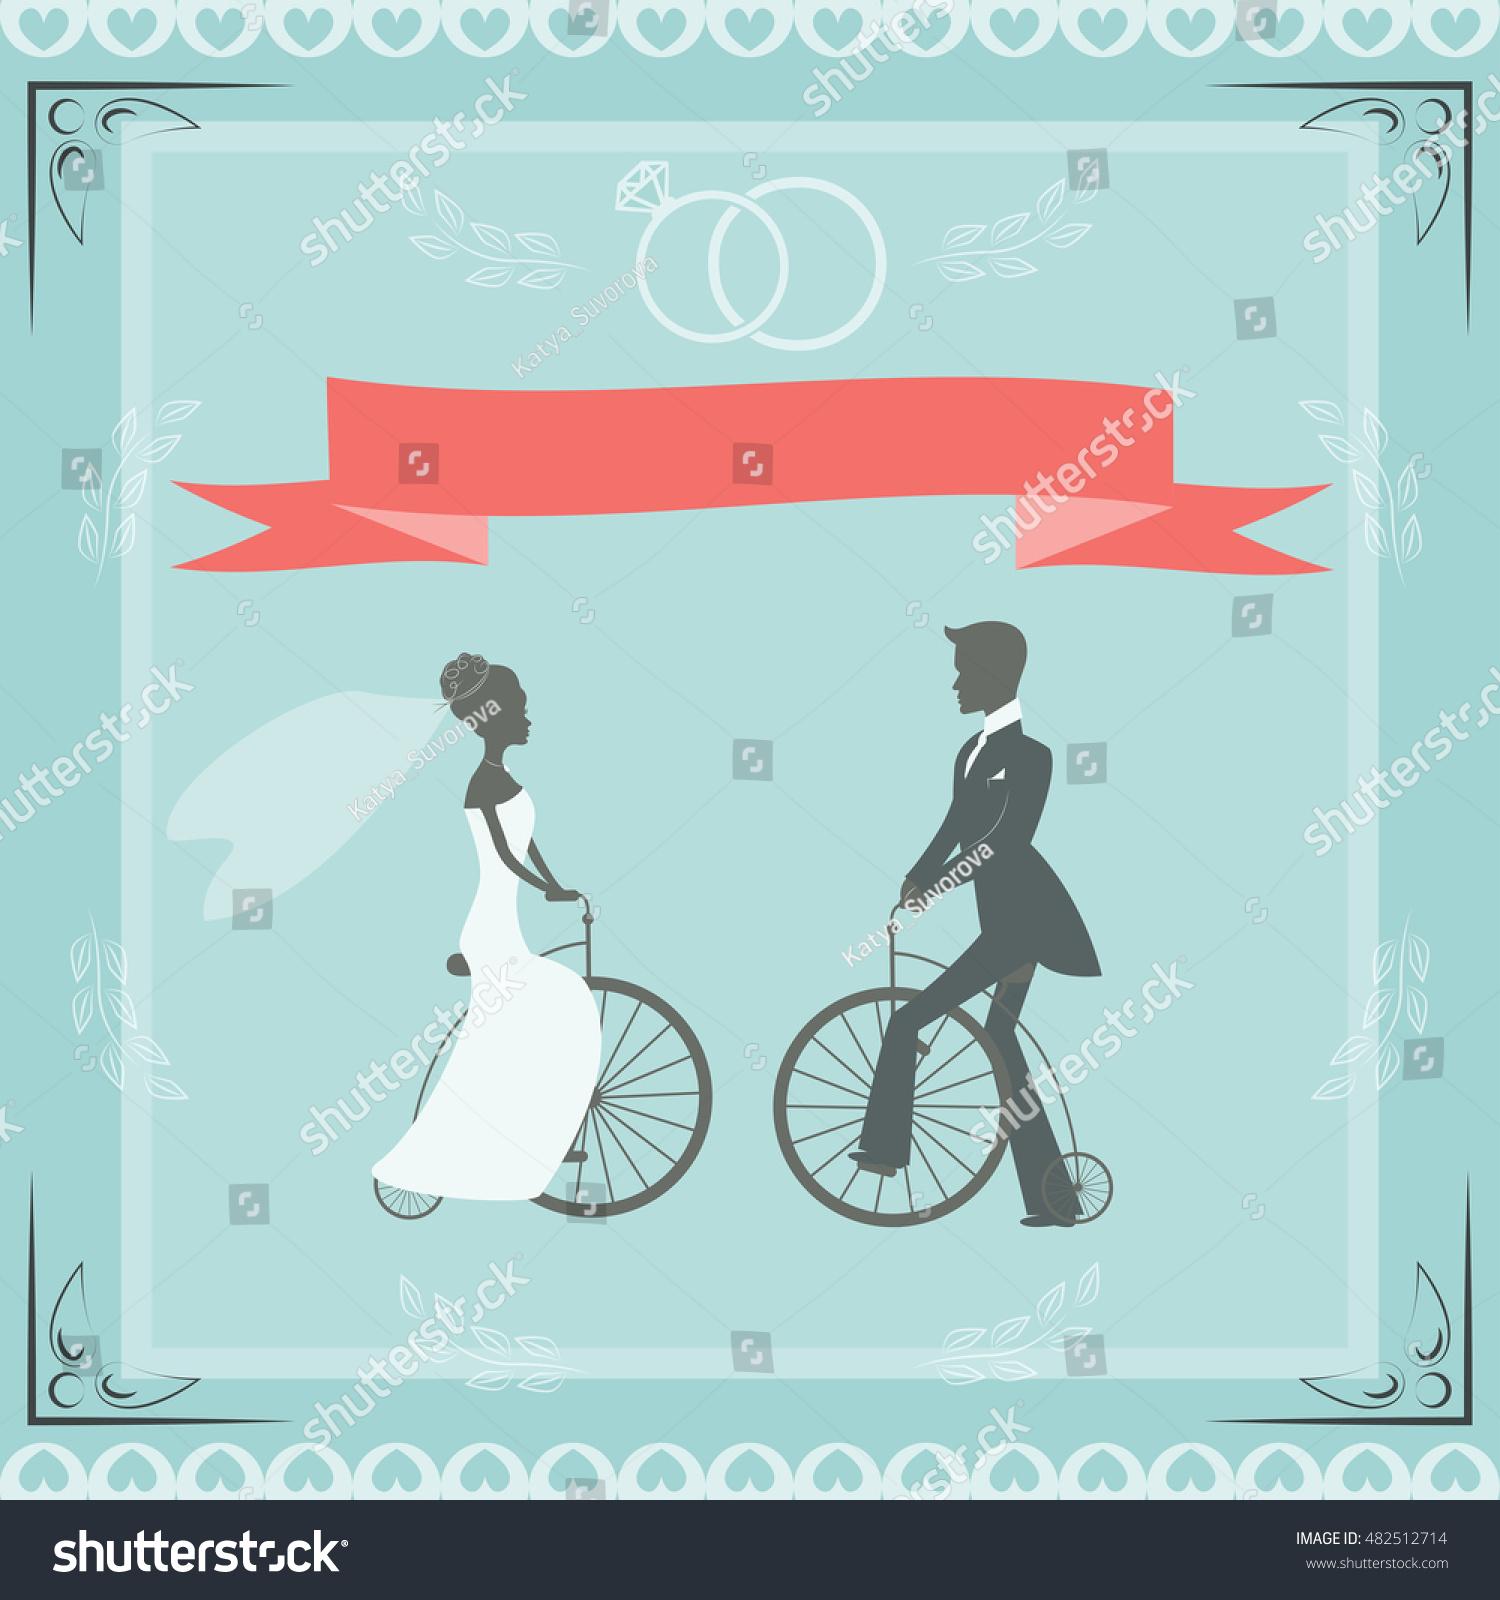 Wedding Illustration Greetings Retro Illustration Newlymarried Stock